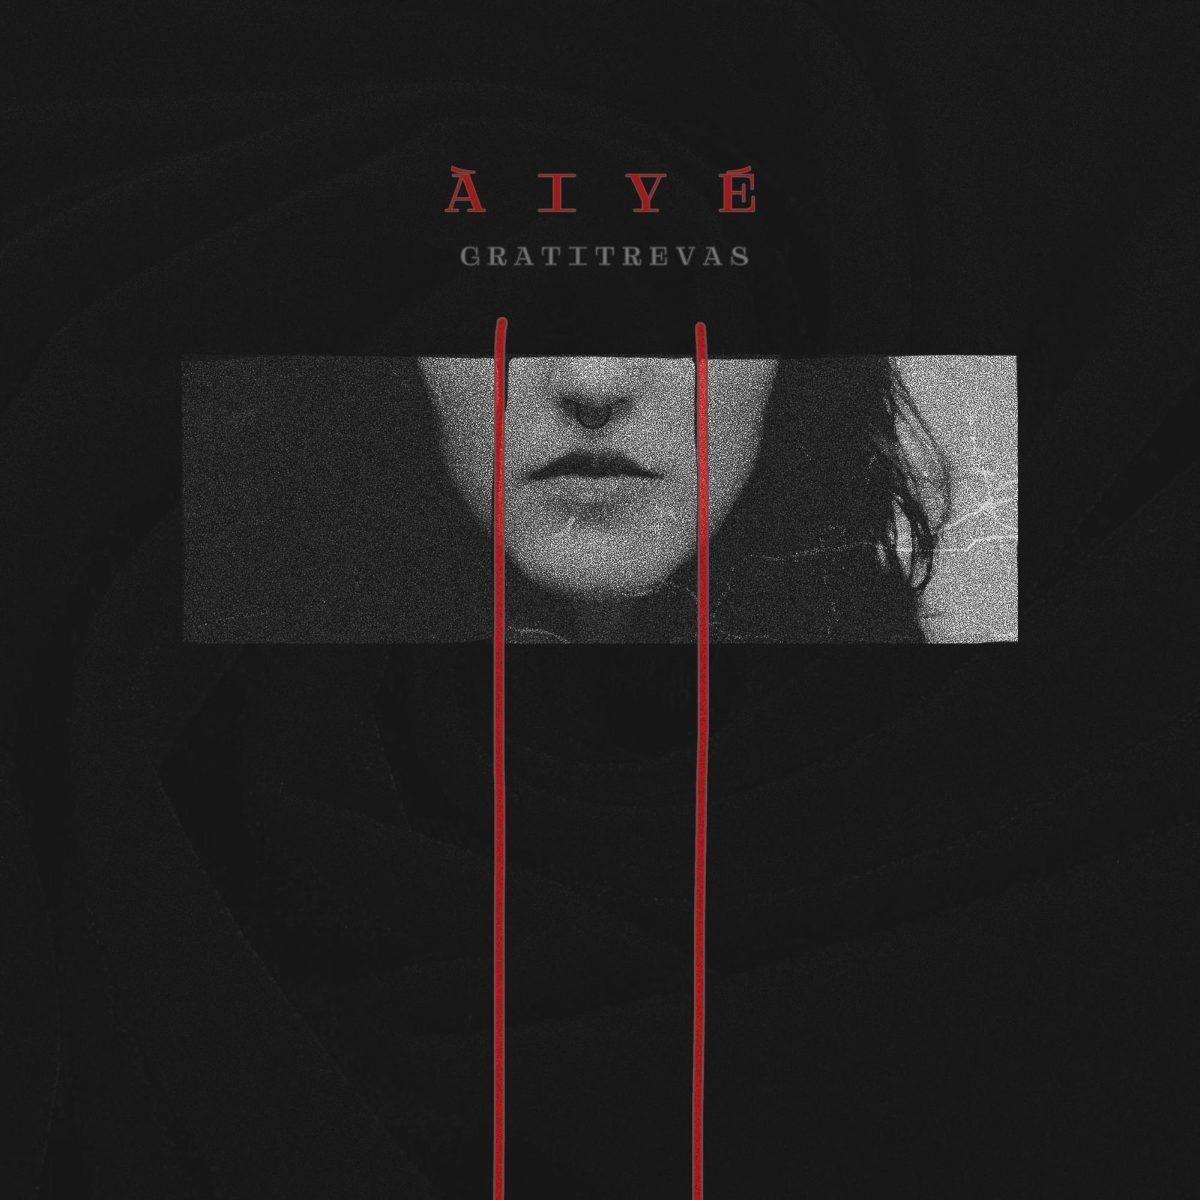 AIYE - Gratitrevas